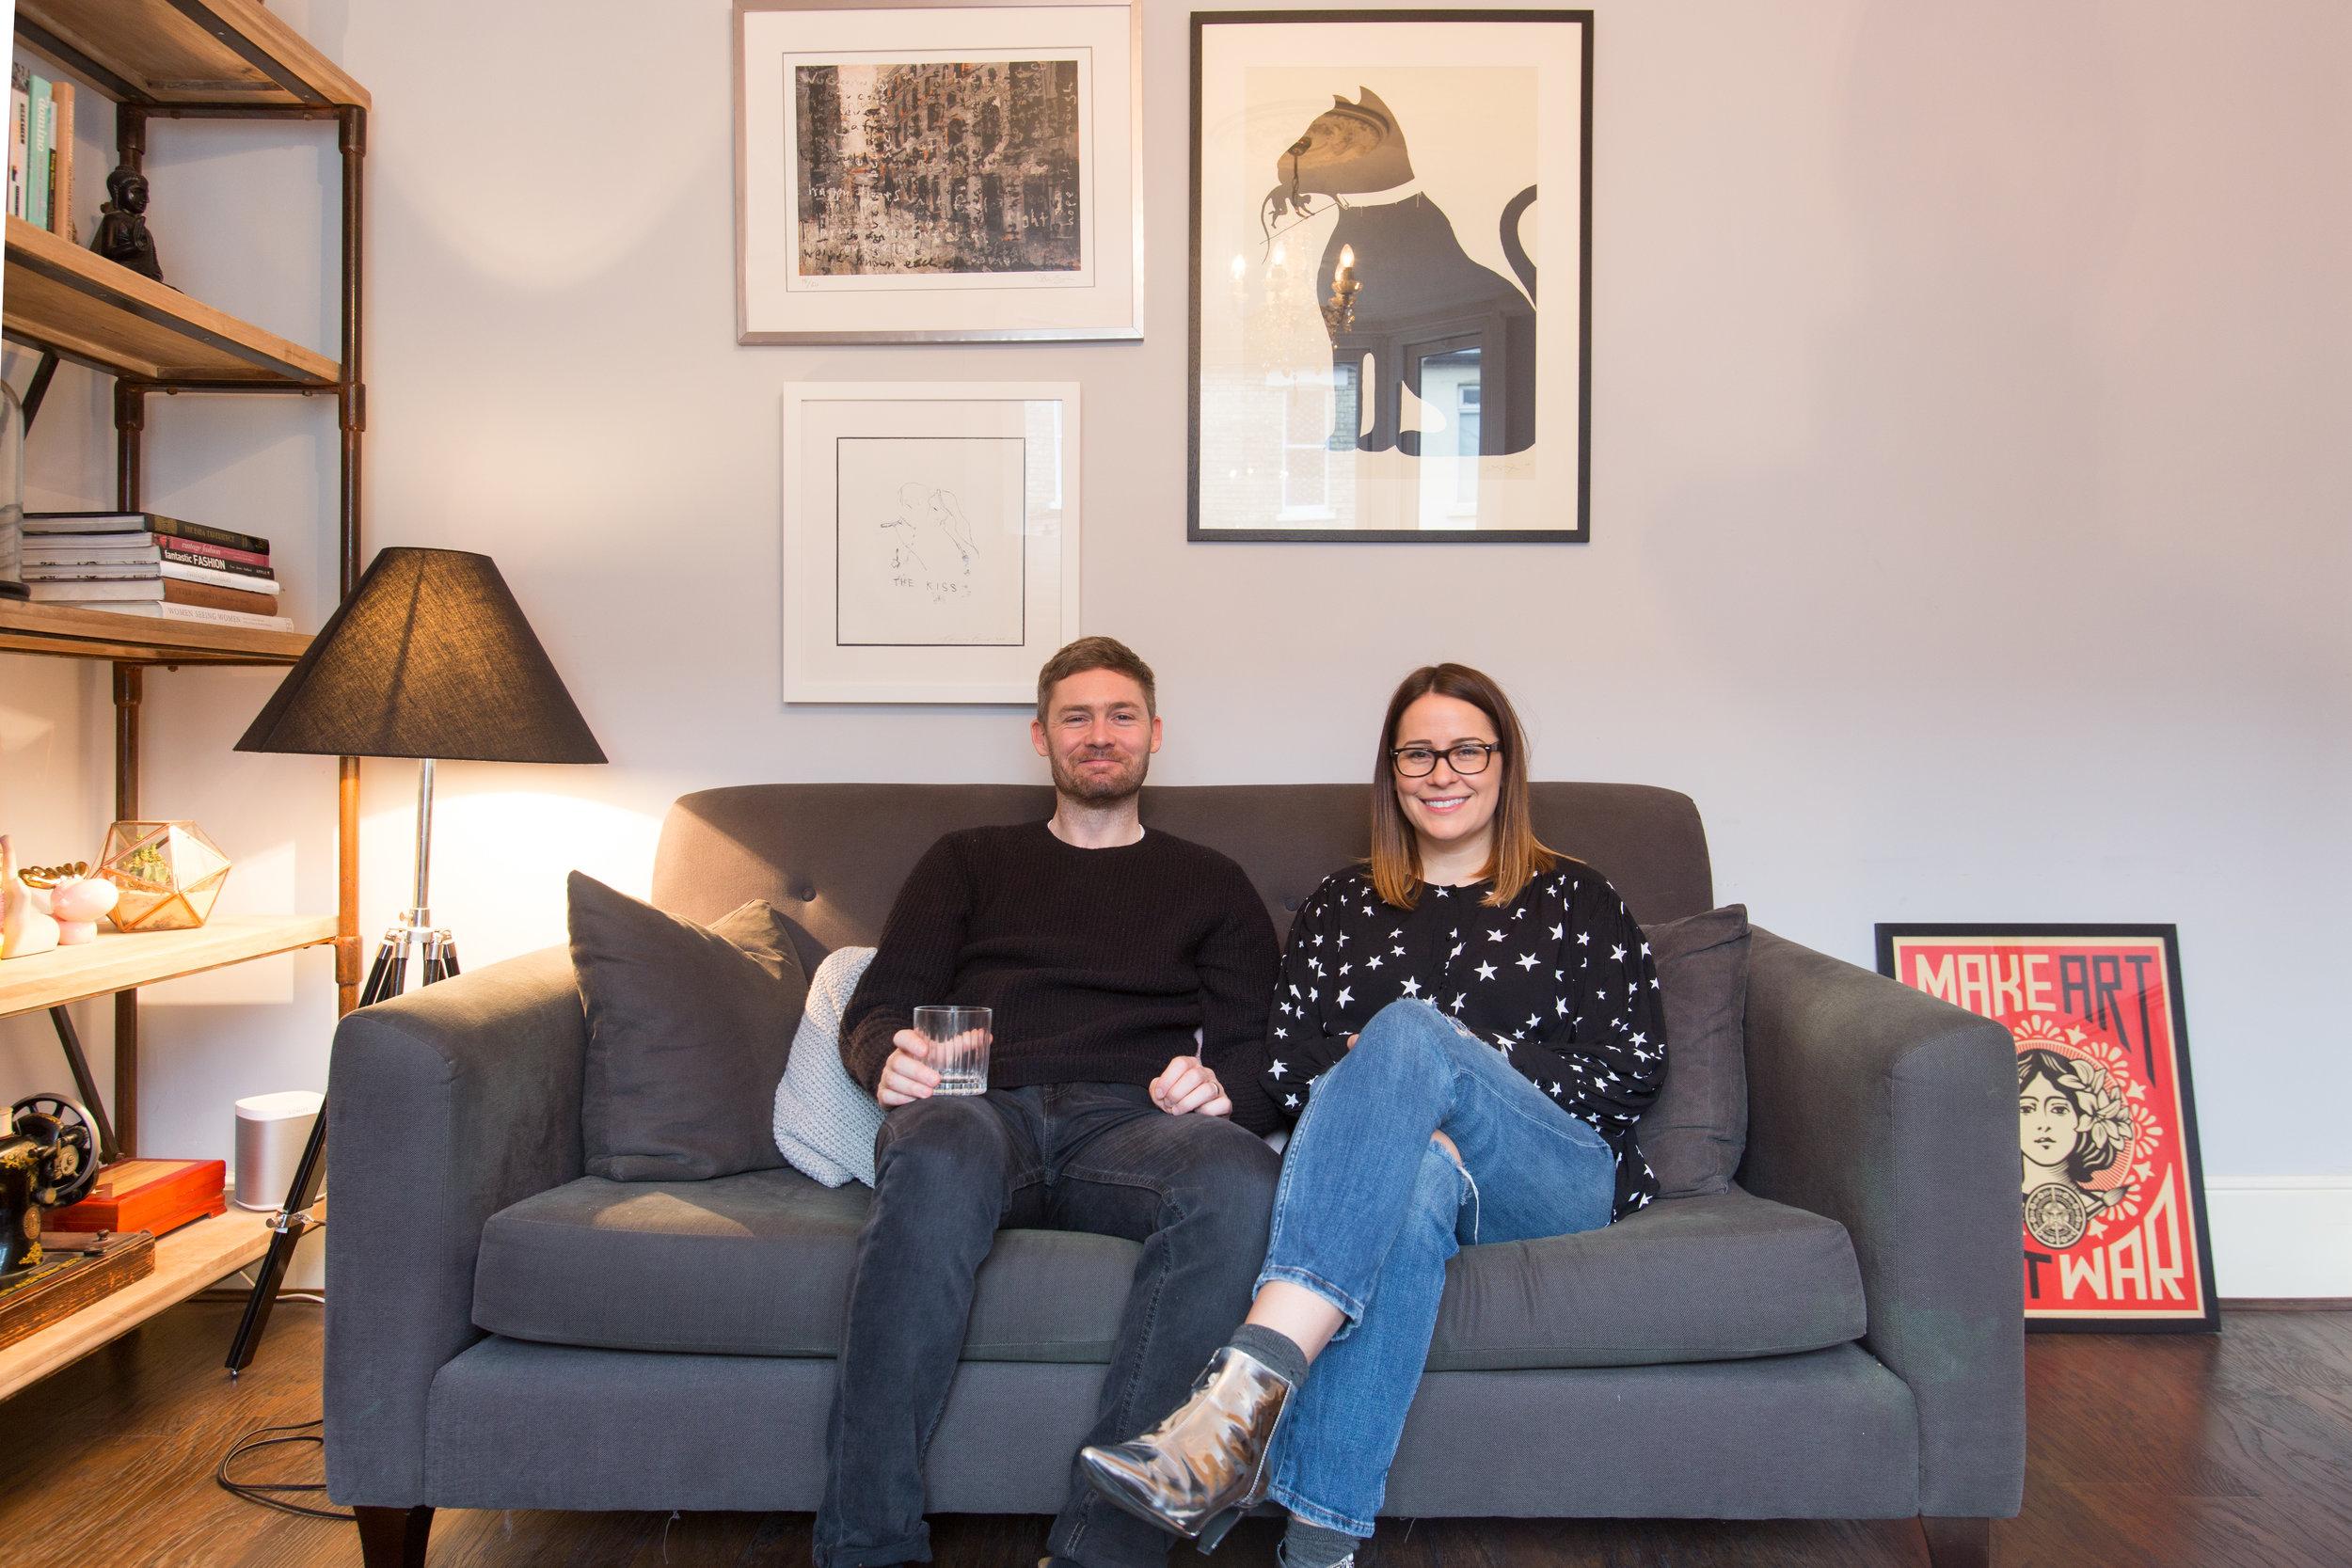 Interior blogger Amanda Cotton (aka House Lust) and her husband Jess Cotton